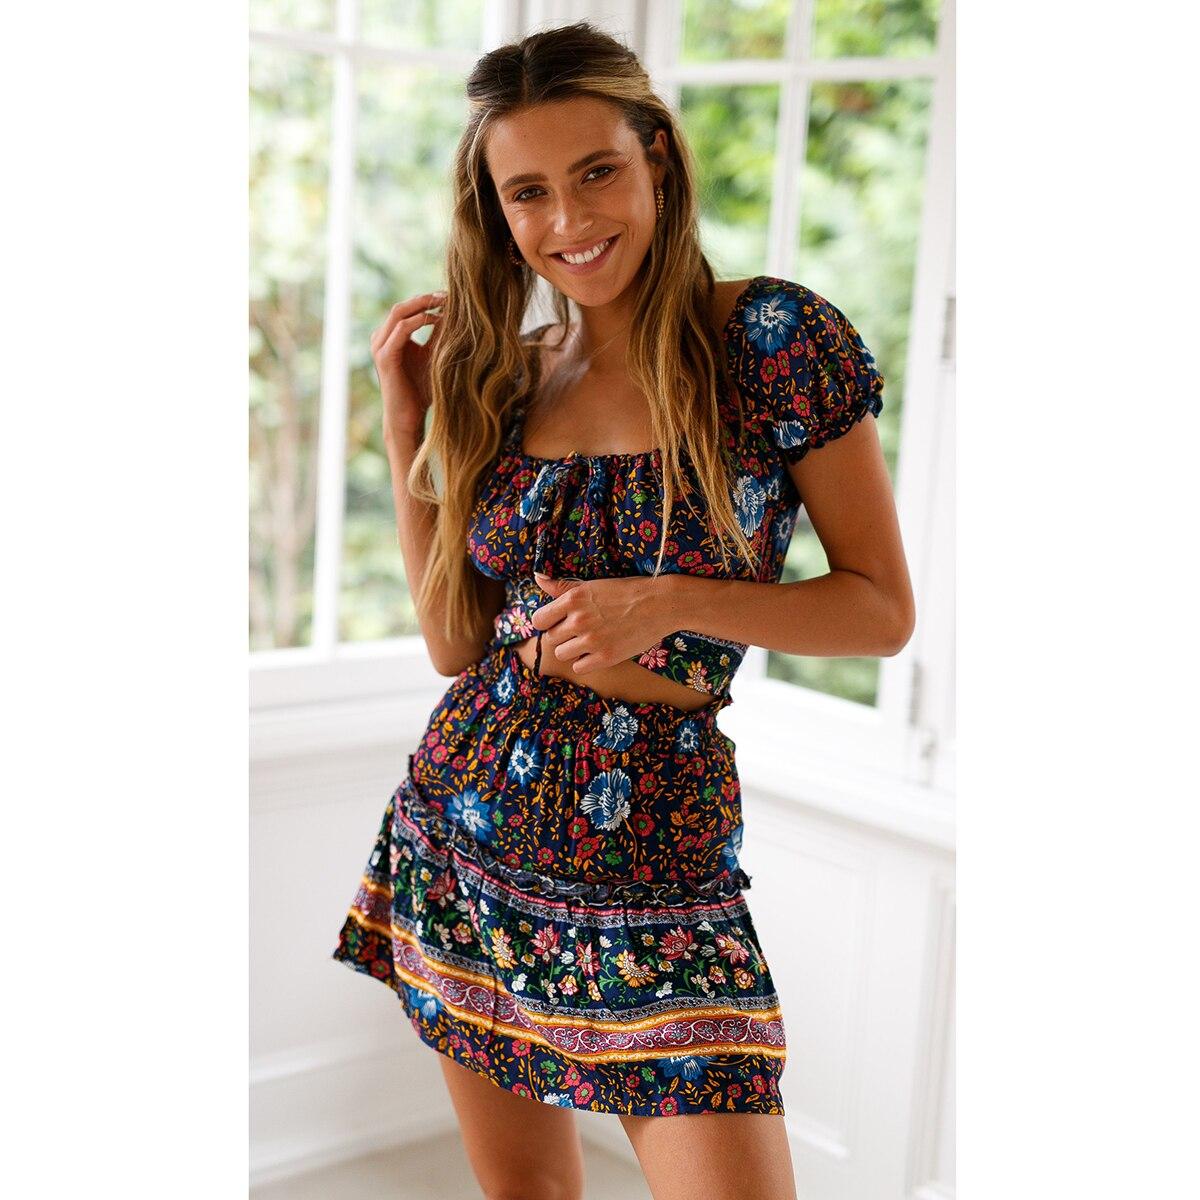 a4b80a0bdad4 Navy Floral Printed Crop Top Skirt Set 2019 Summer Women Short Sleeve Mini  Dress Set Suit Boho Sexy Beach 2 Two Piece Sets